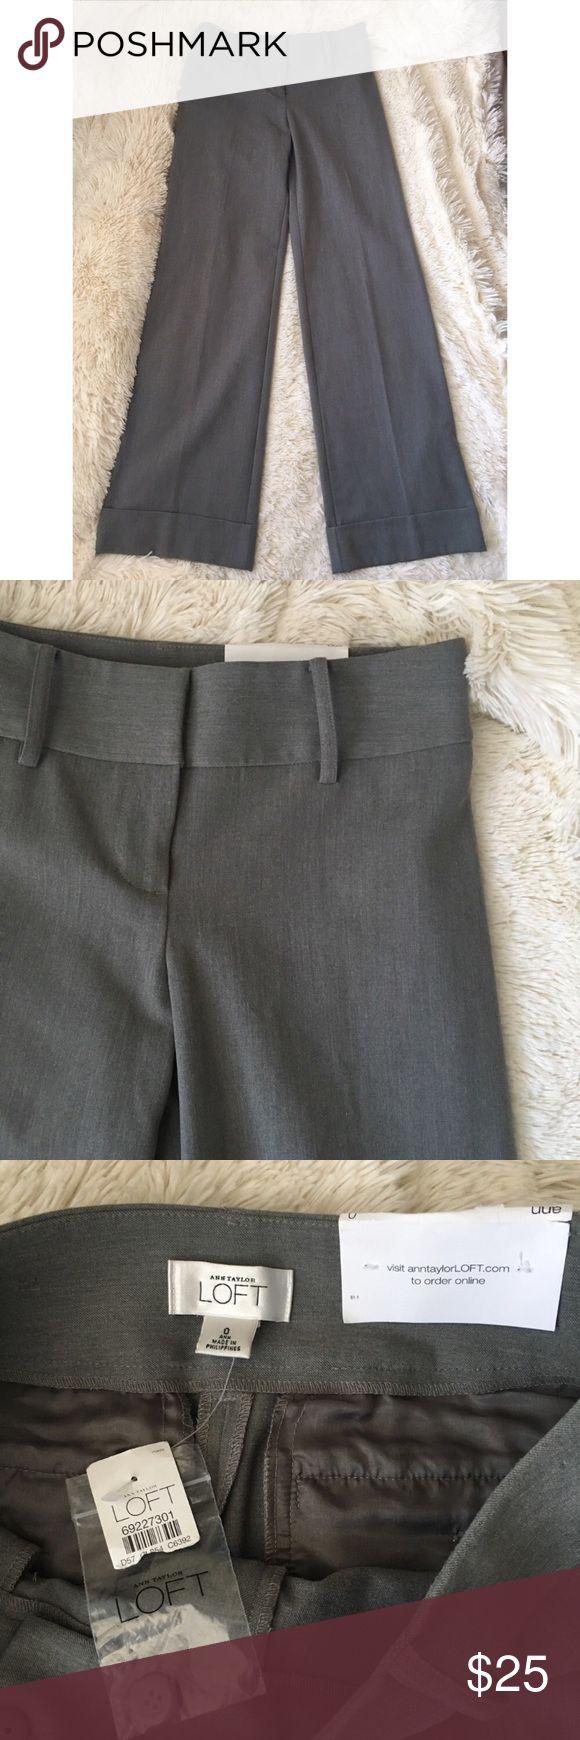 I just added this listing on Poshmark: NWT Ann Taylor LOFT Dress Pants size 0. #shopmycloset #poshmark #fashion #shopping #style #forsale #LOFT #Pants